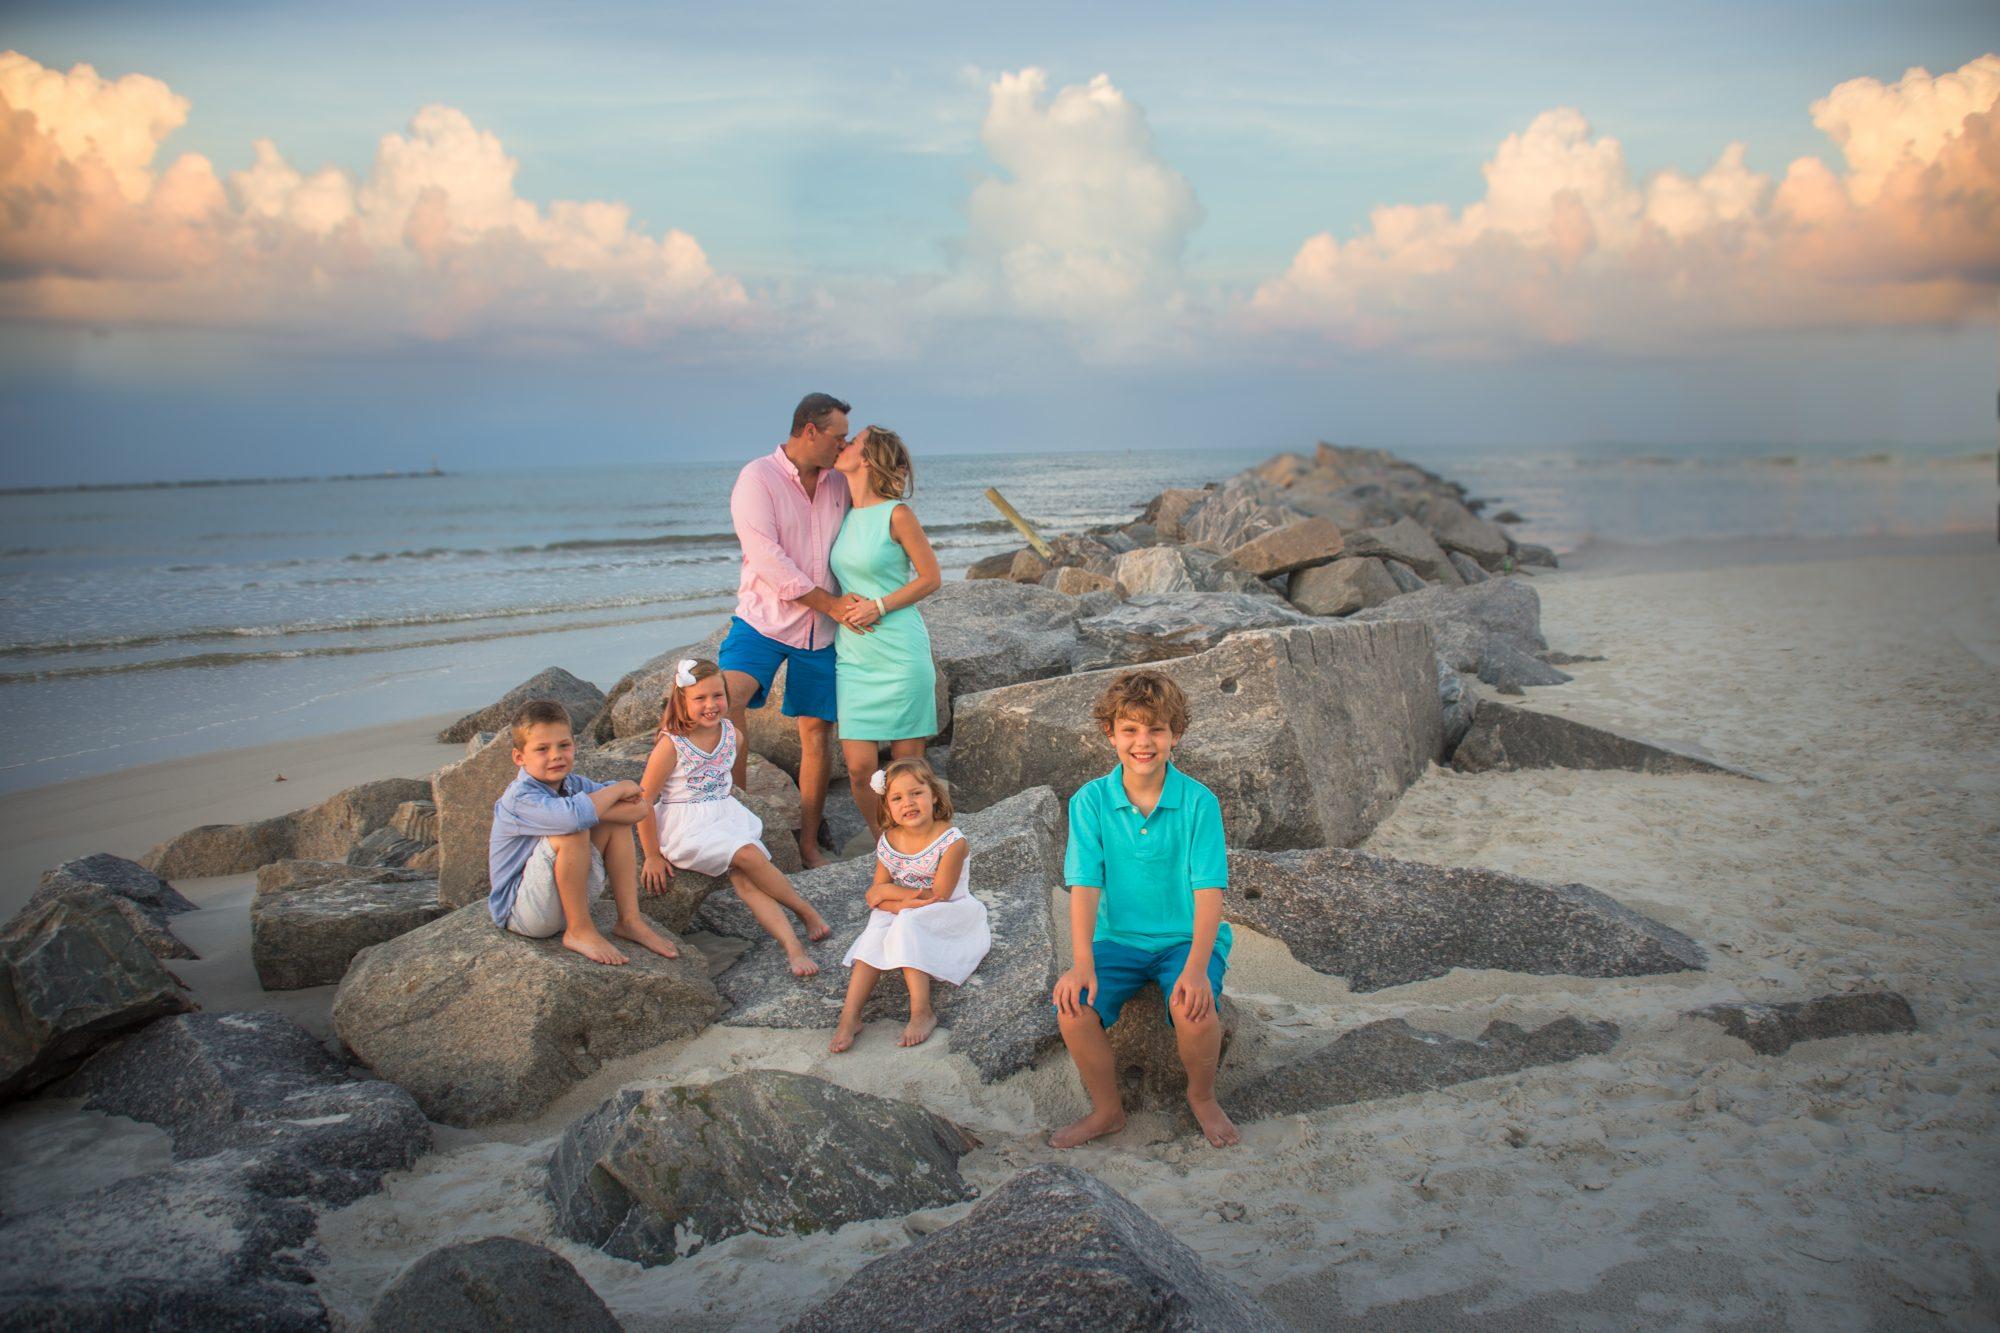 daytona beach photography session at smyrna dunes park by daytona beach photographer beach vacation photography package